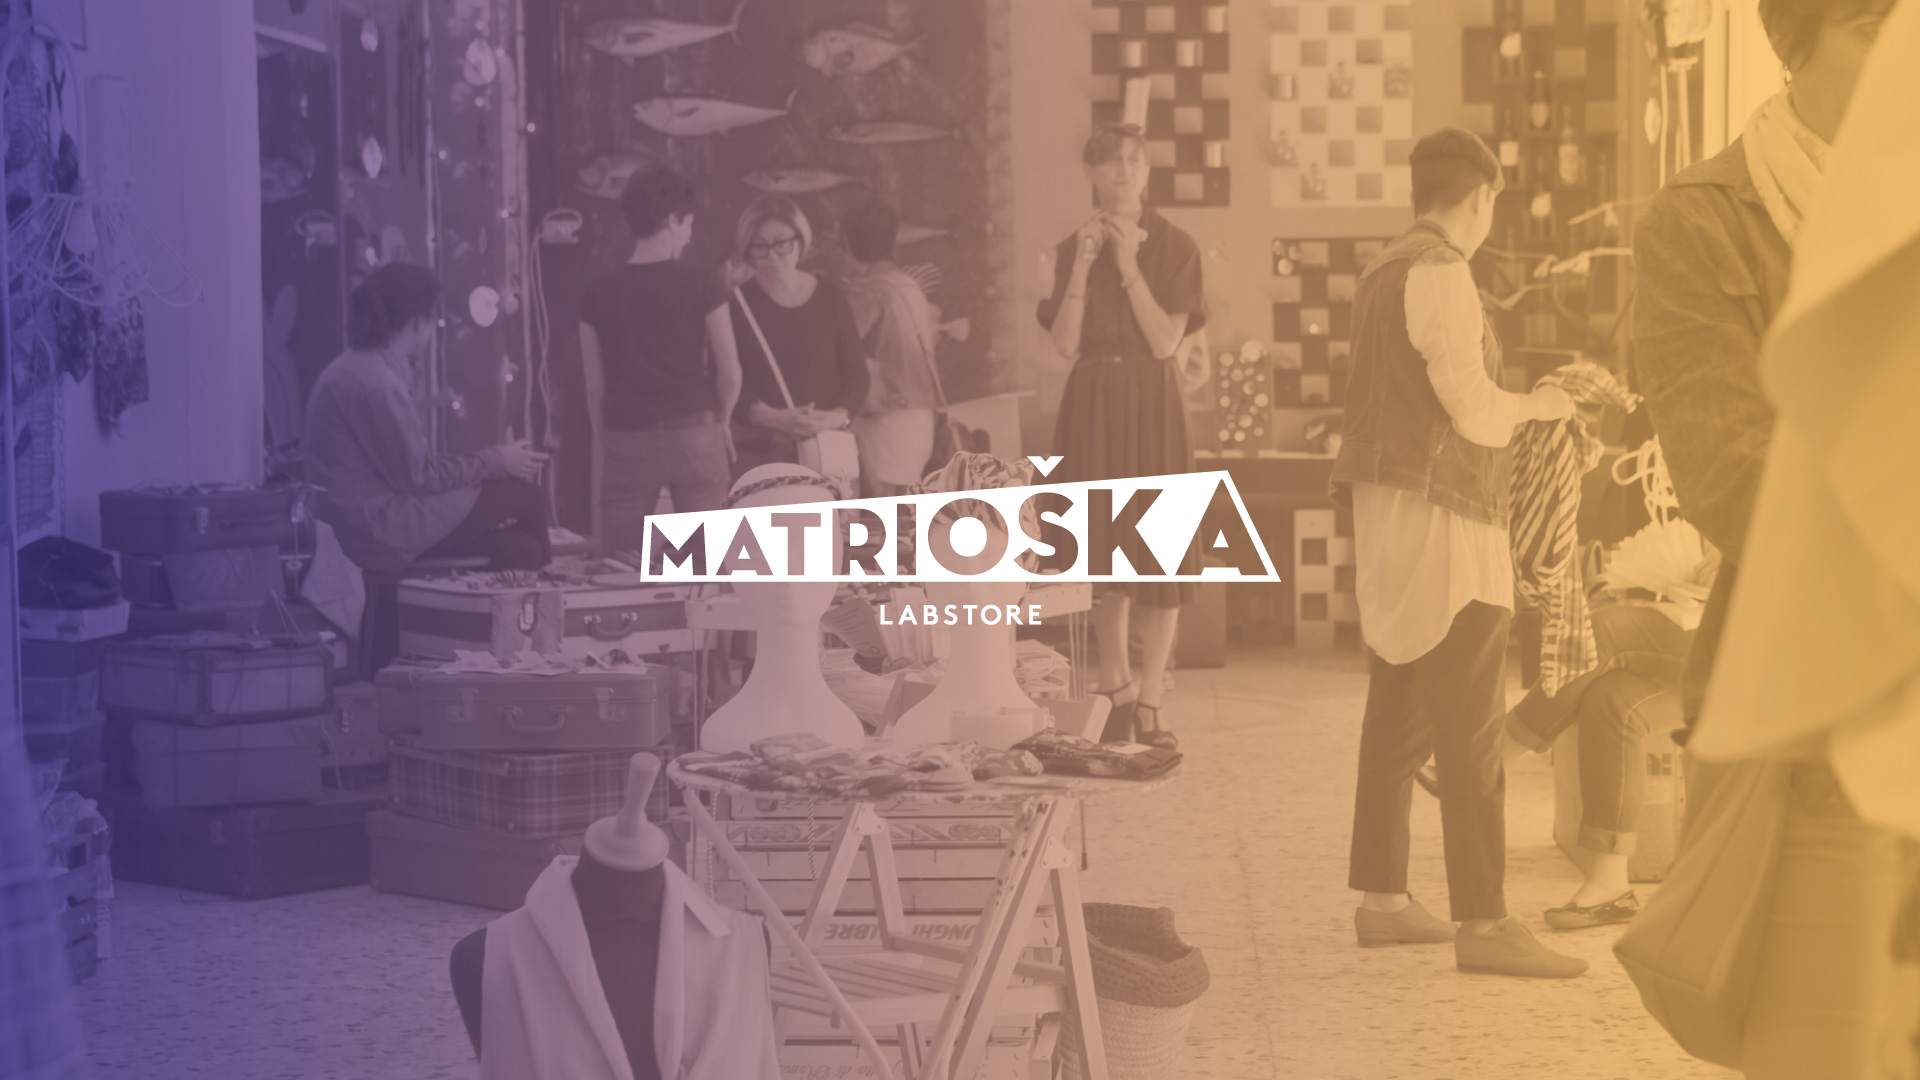 Matrioska_6_manu-fatturieri